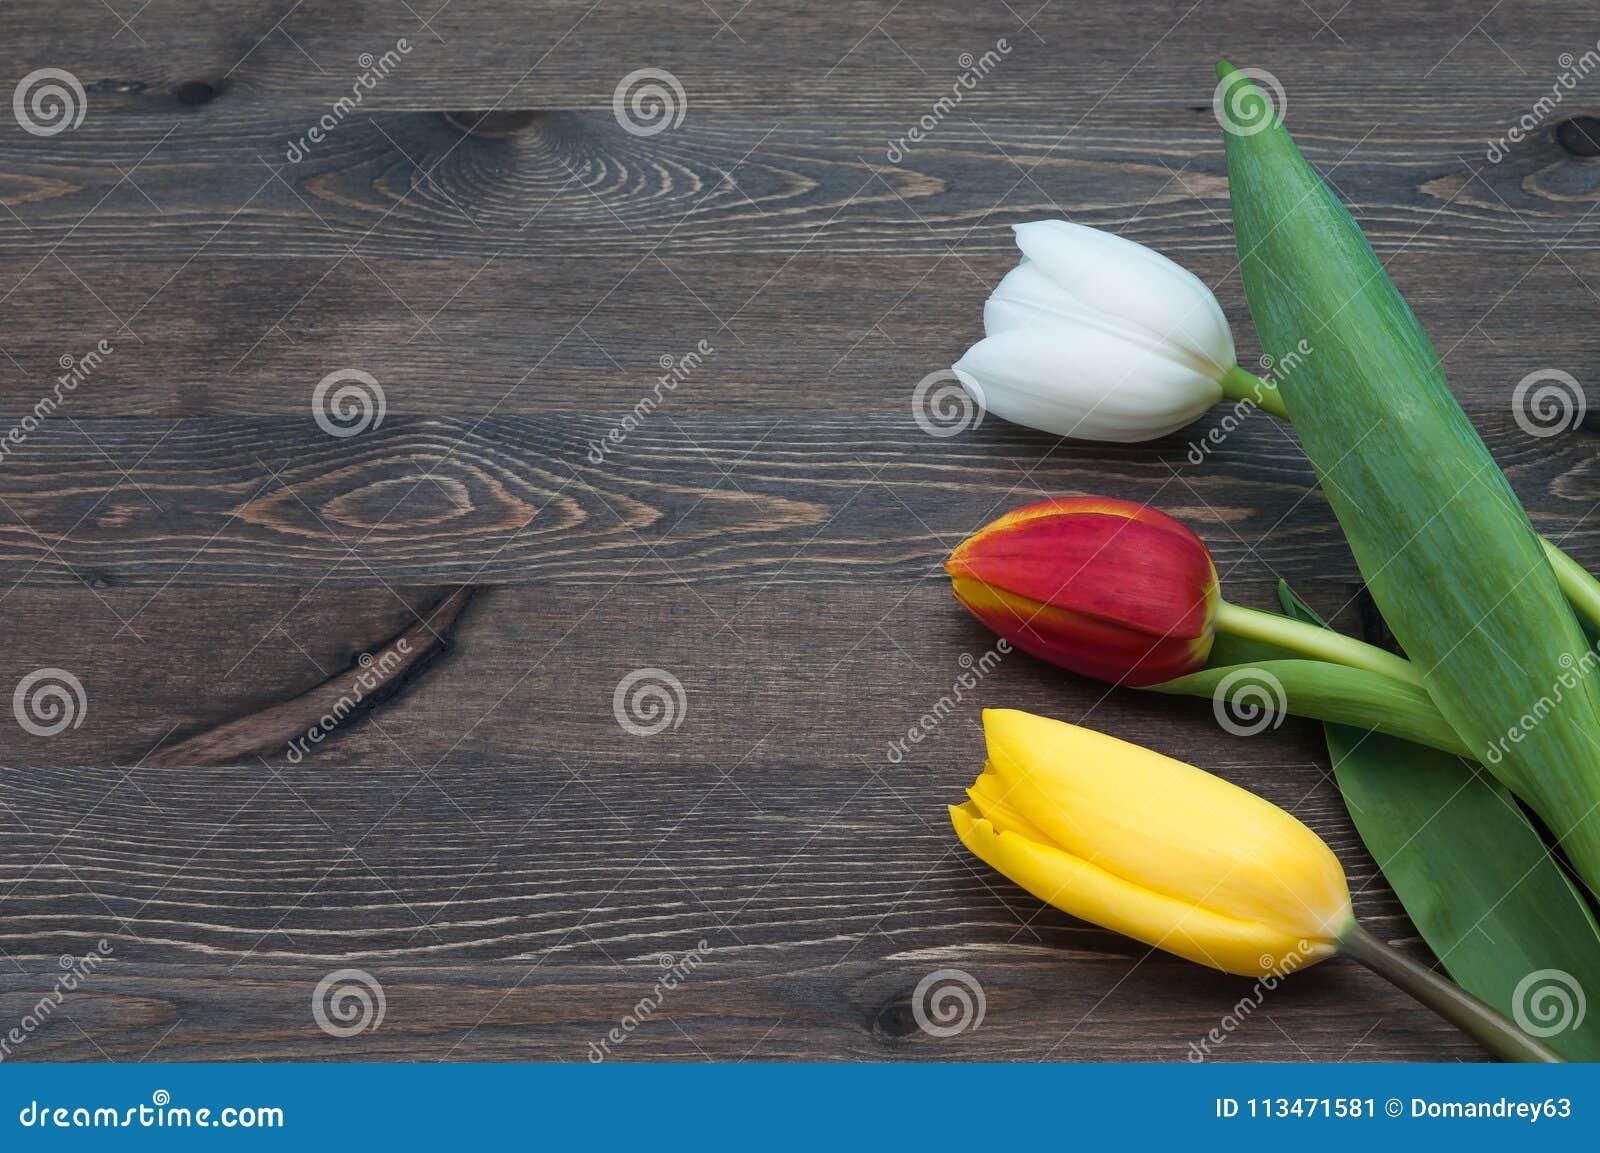 Three multicolored tulips against a backdrop of dark boards.